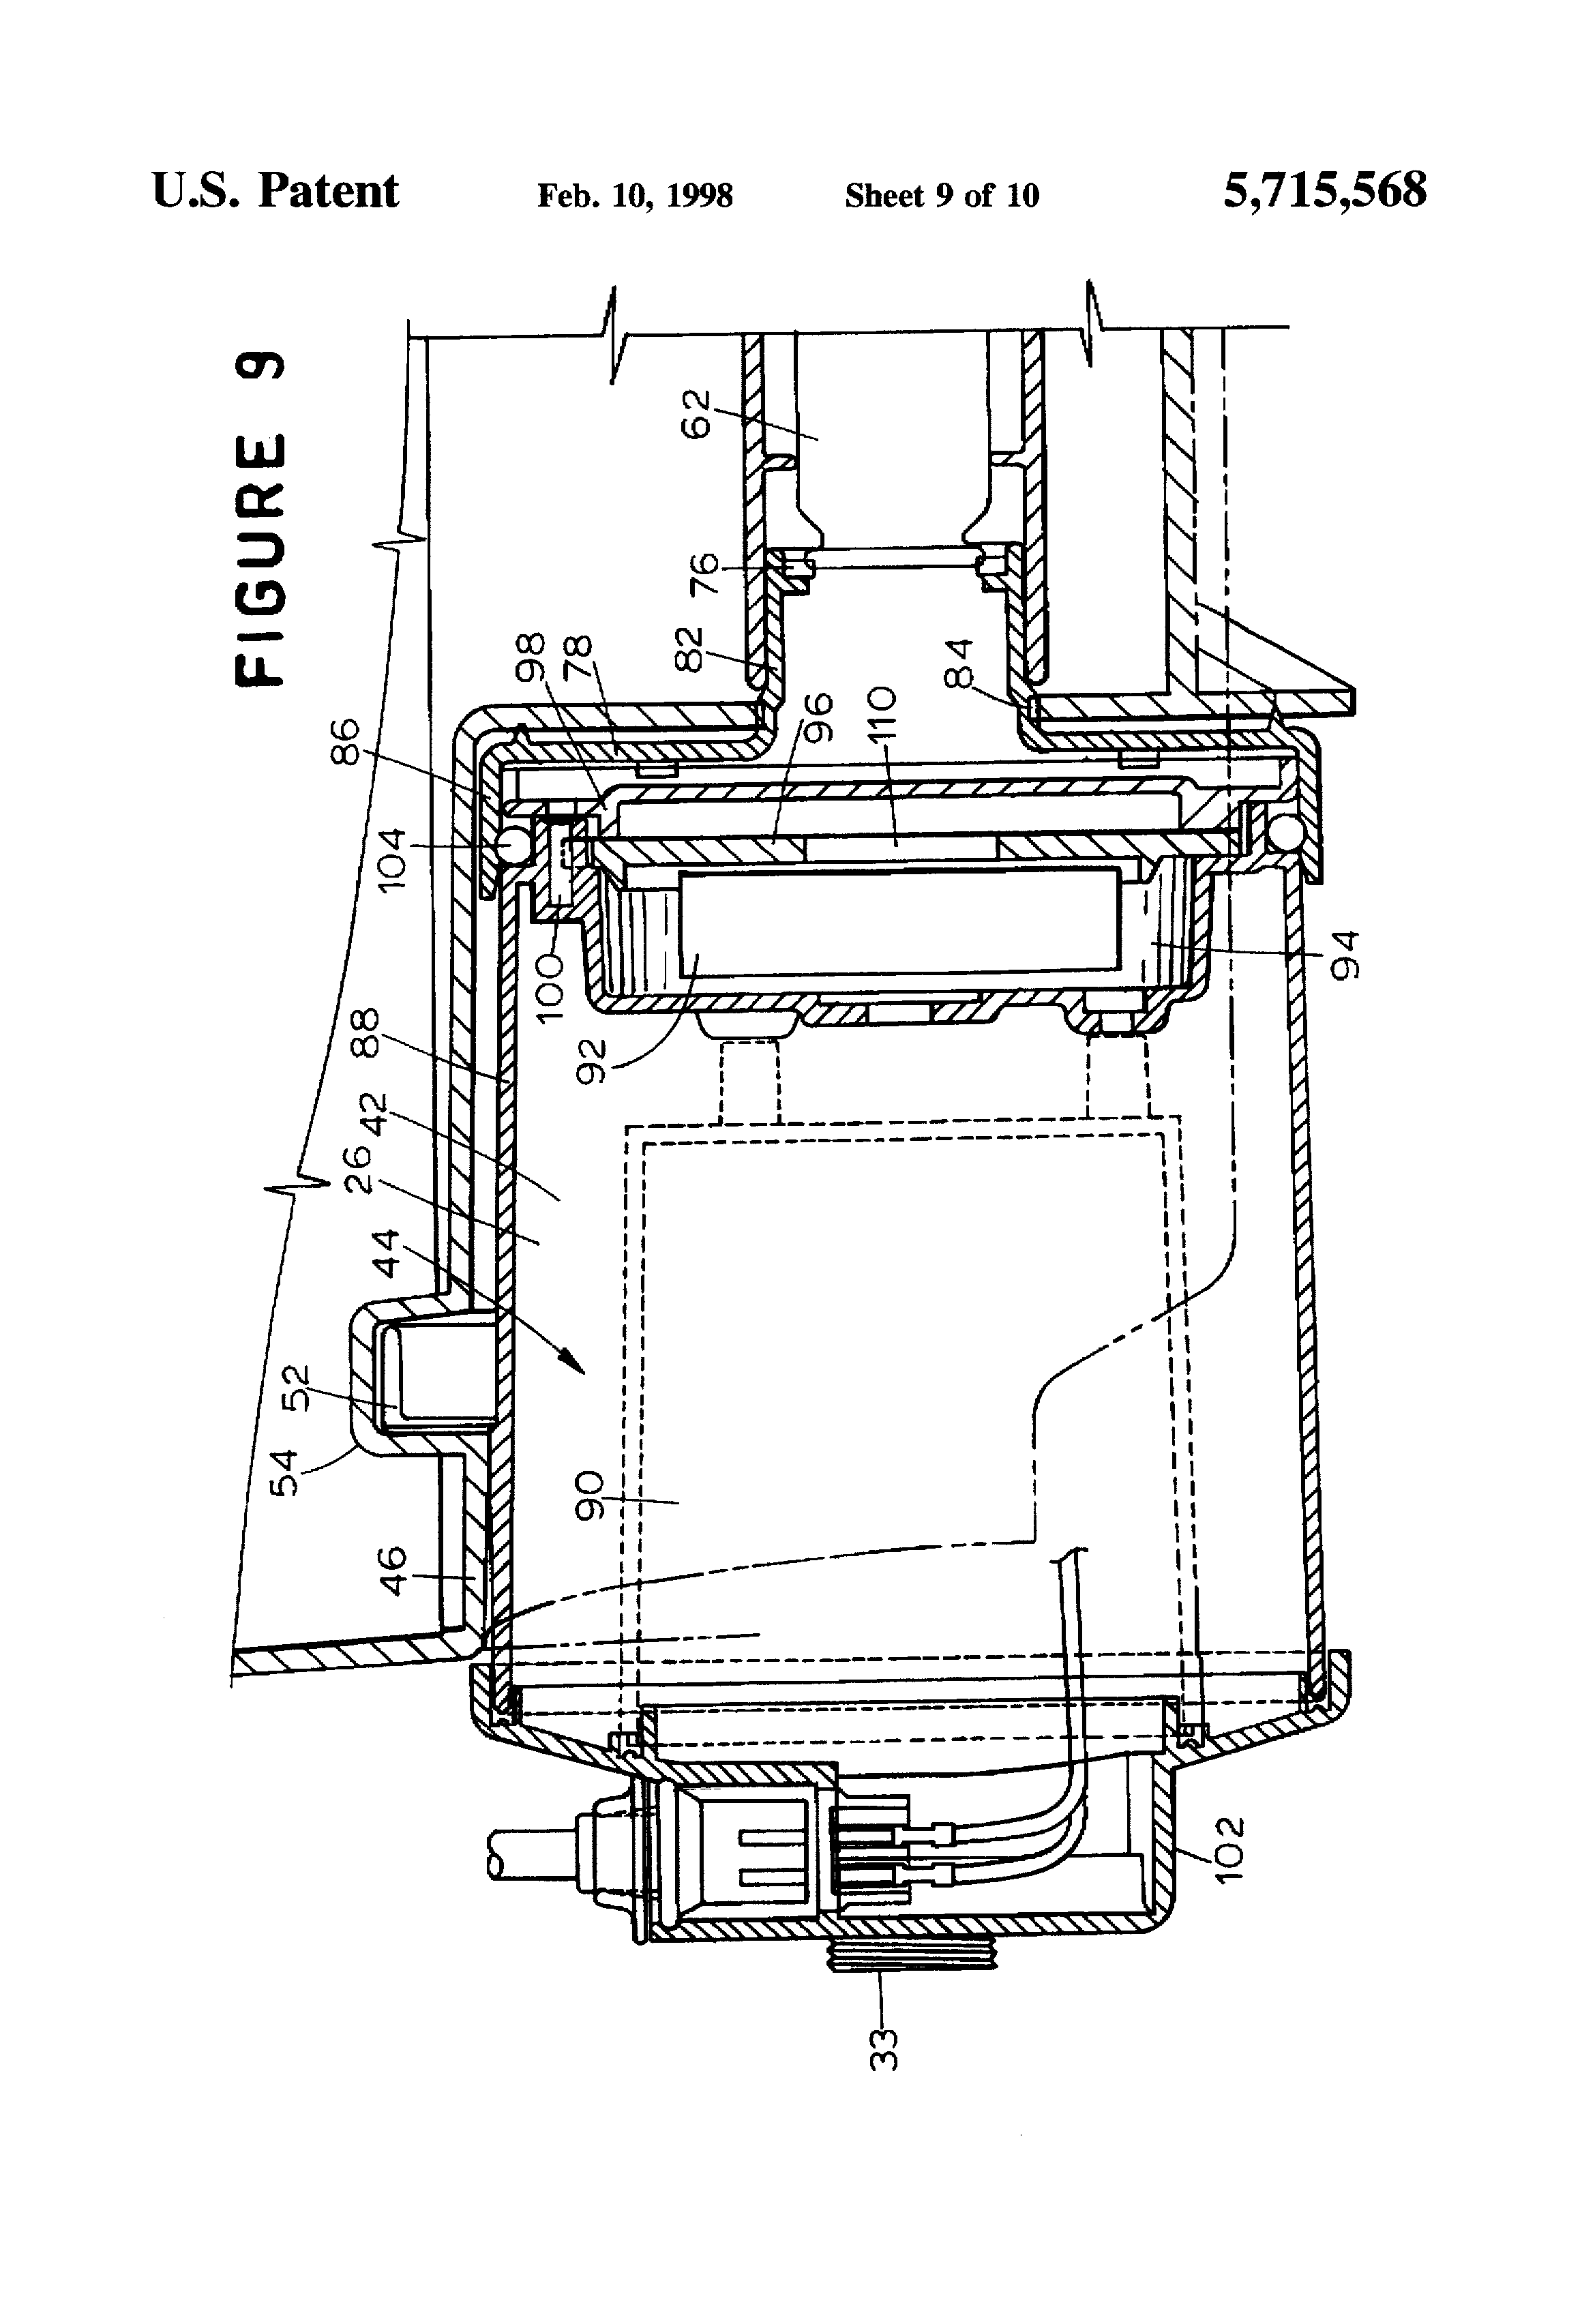 Patent Us5715568 Vacuum Apparatus Having A Pump For Discharging Diagram Parts List Model 1960 Bissellparts Wetcarpetcleaner Drawing